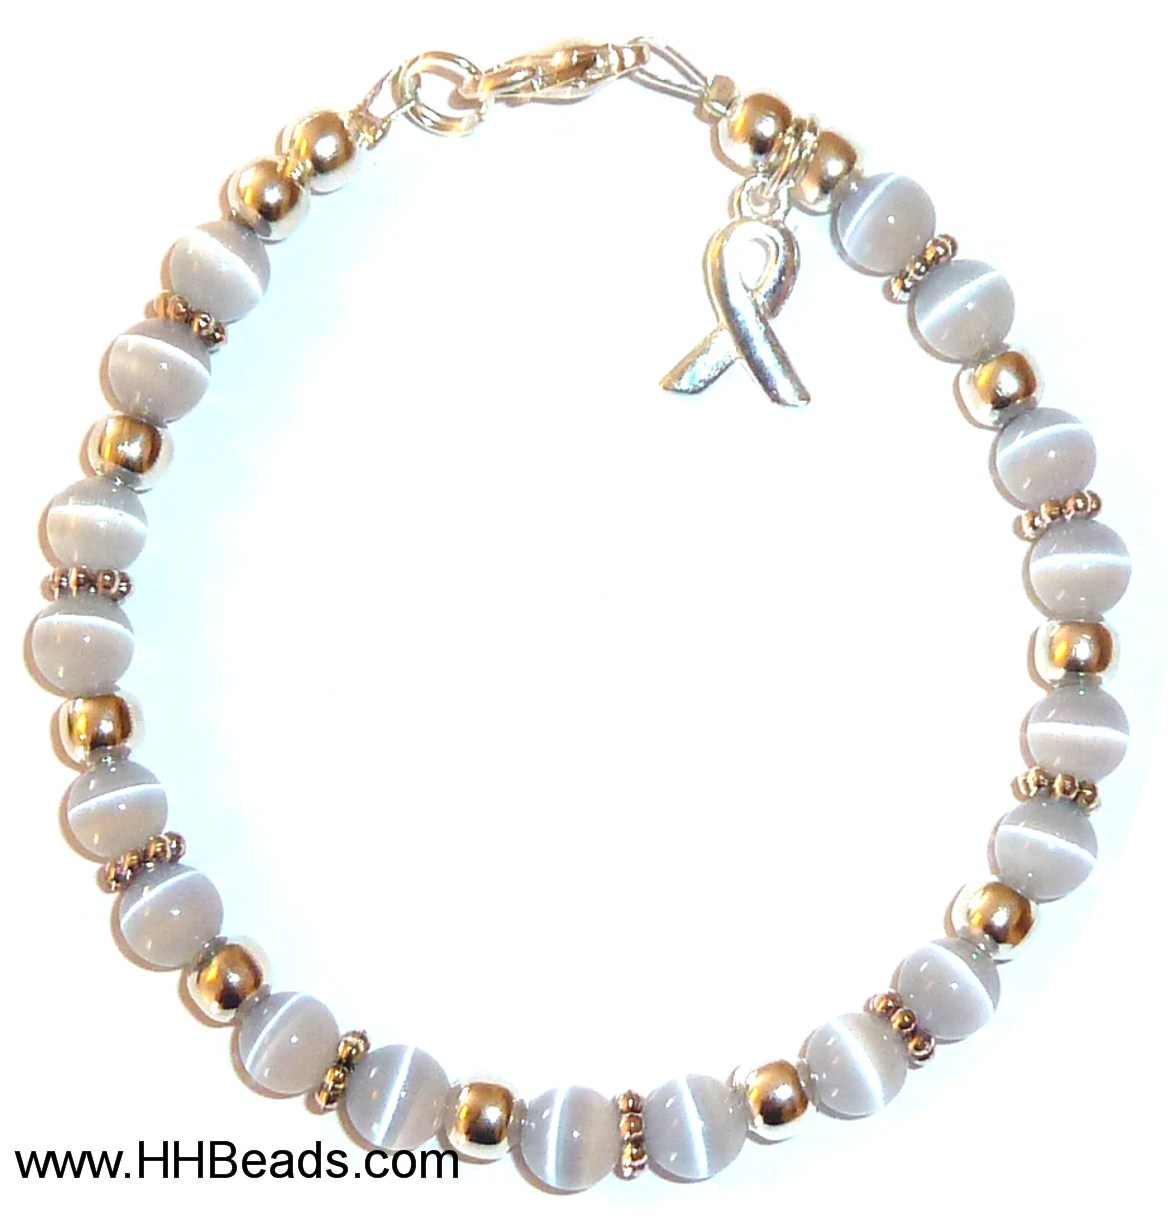 Brain Cancer Awareness Bracelet - 6mm